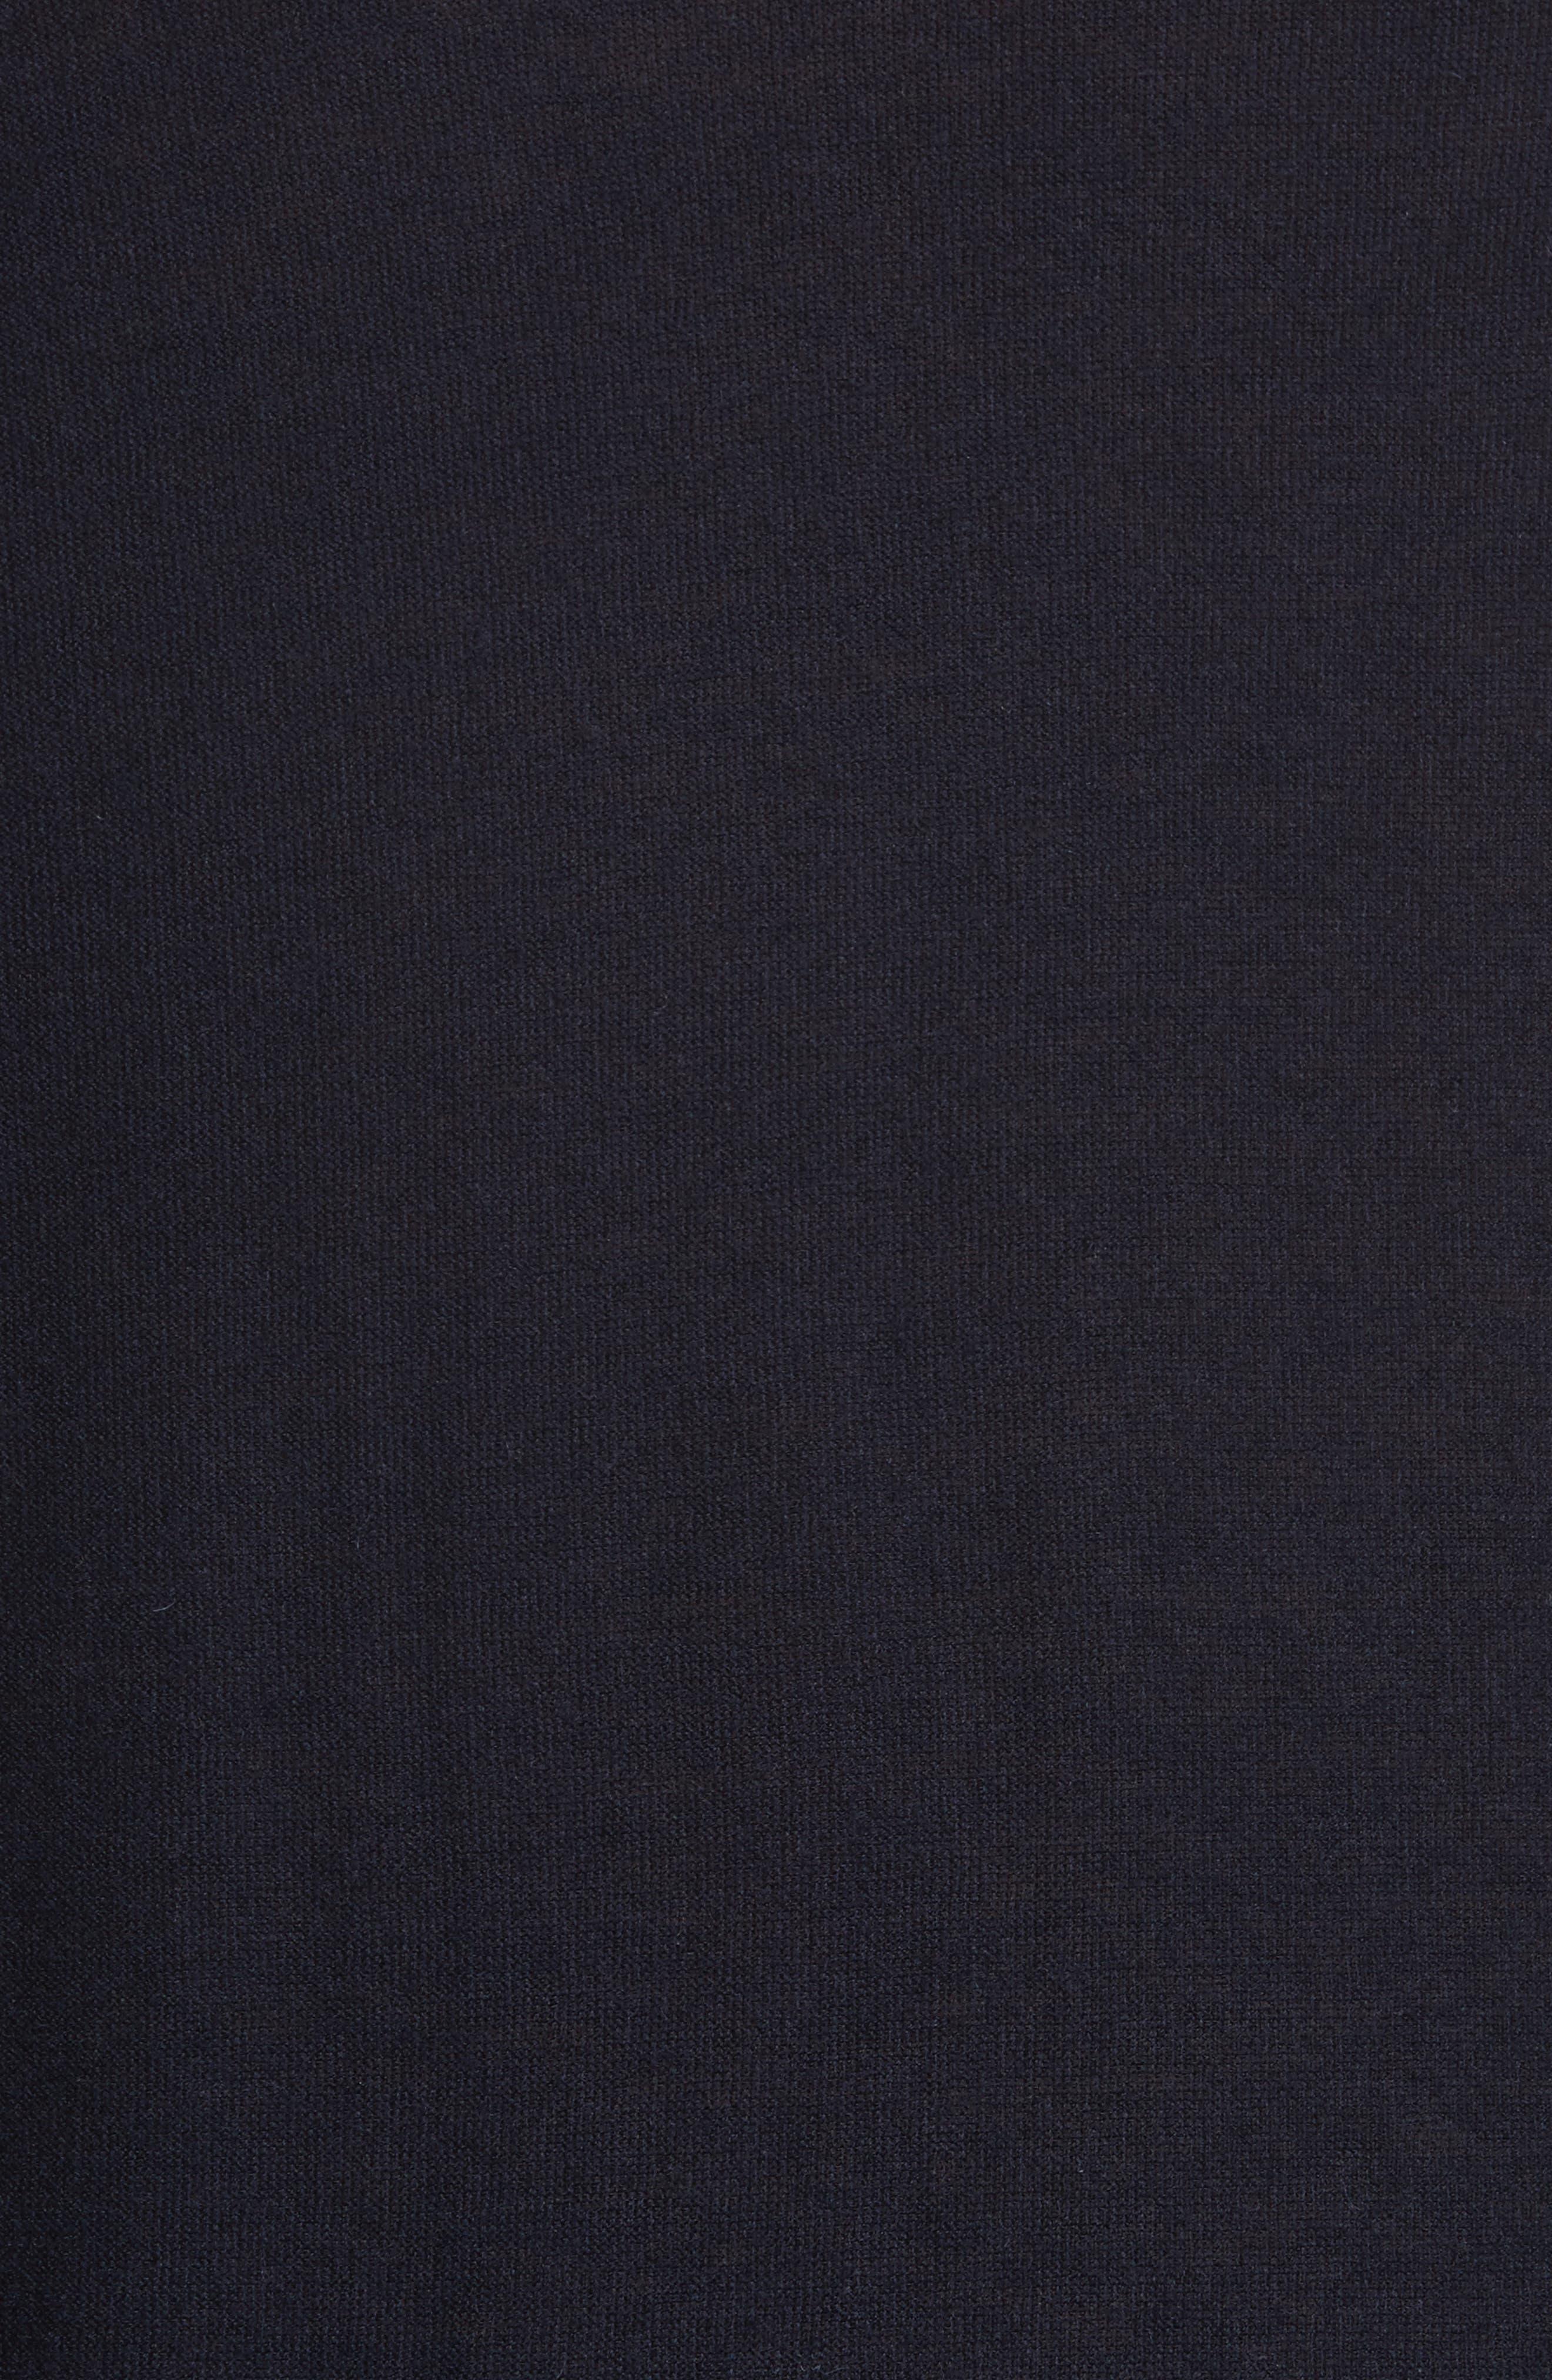 V-Neck Cashair Cashmere Sweater,                             Alternate thumbnail 5, color,                             Navy